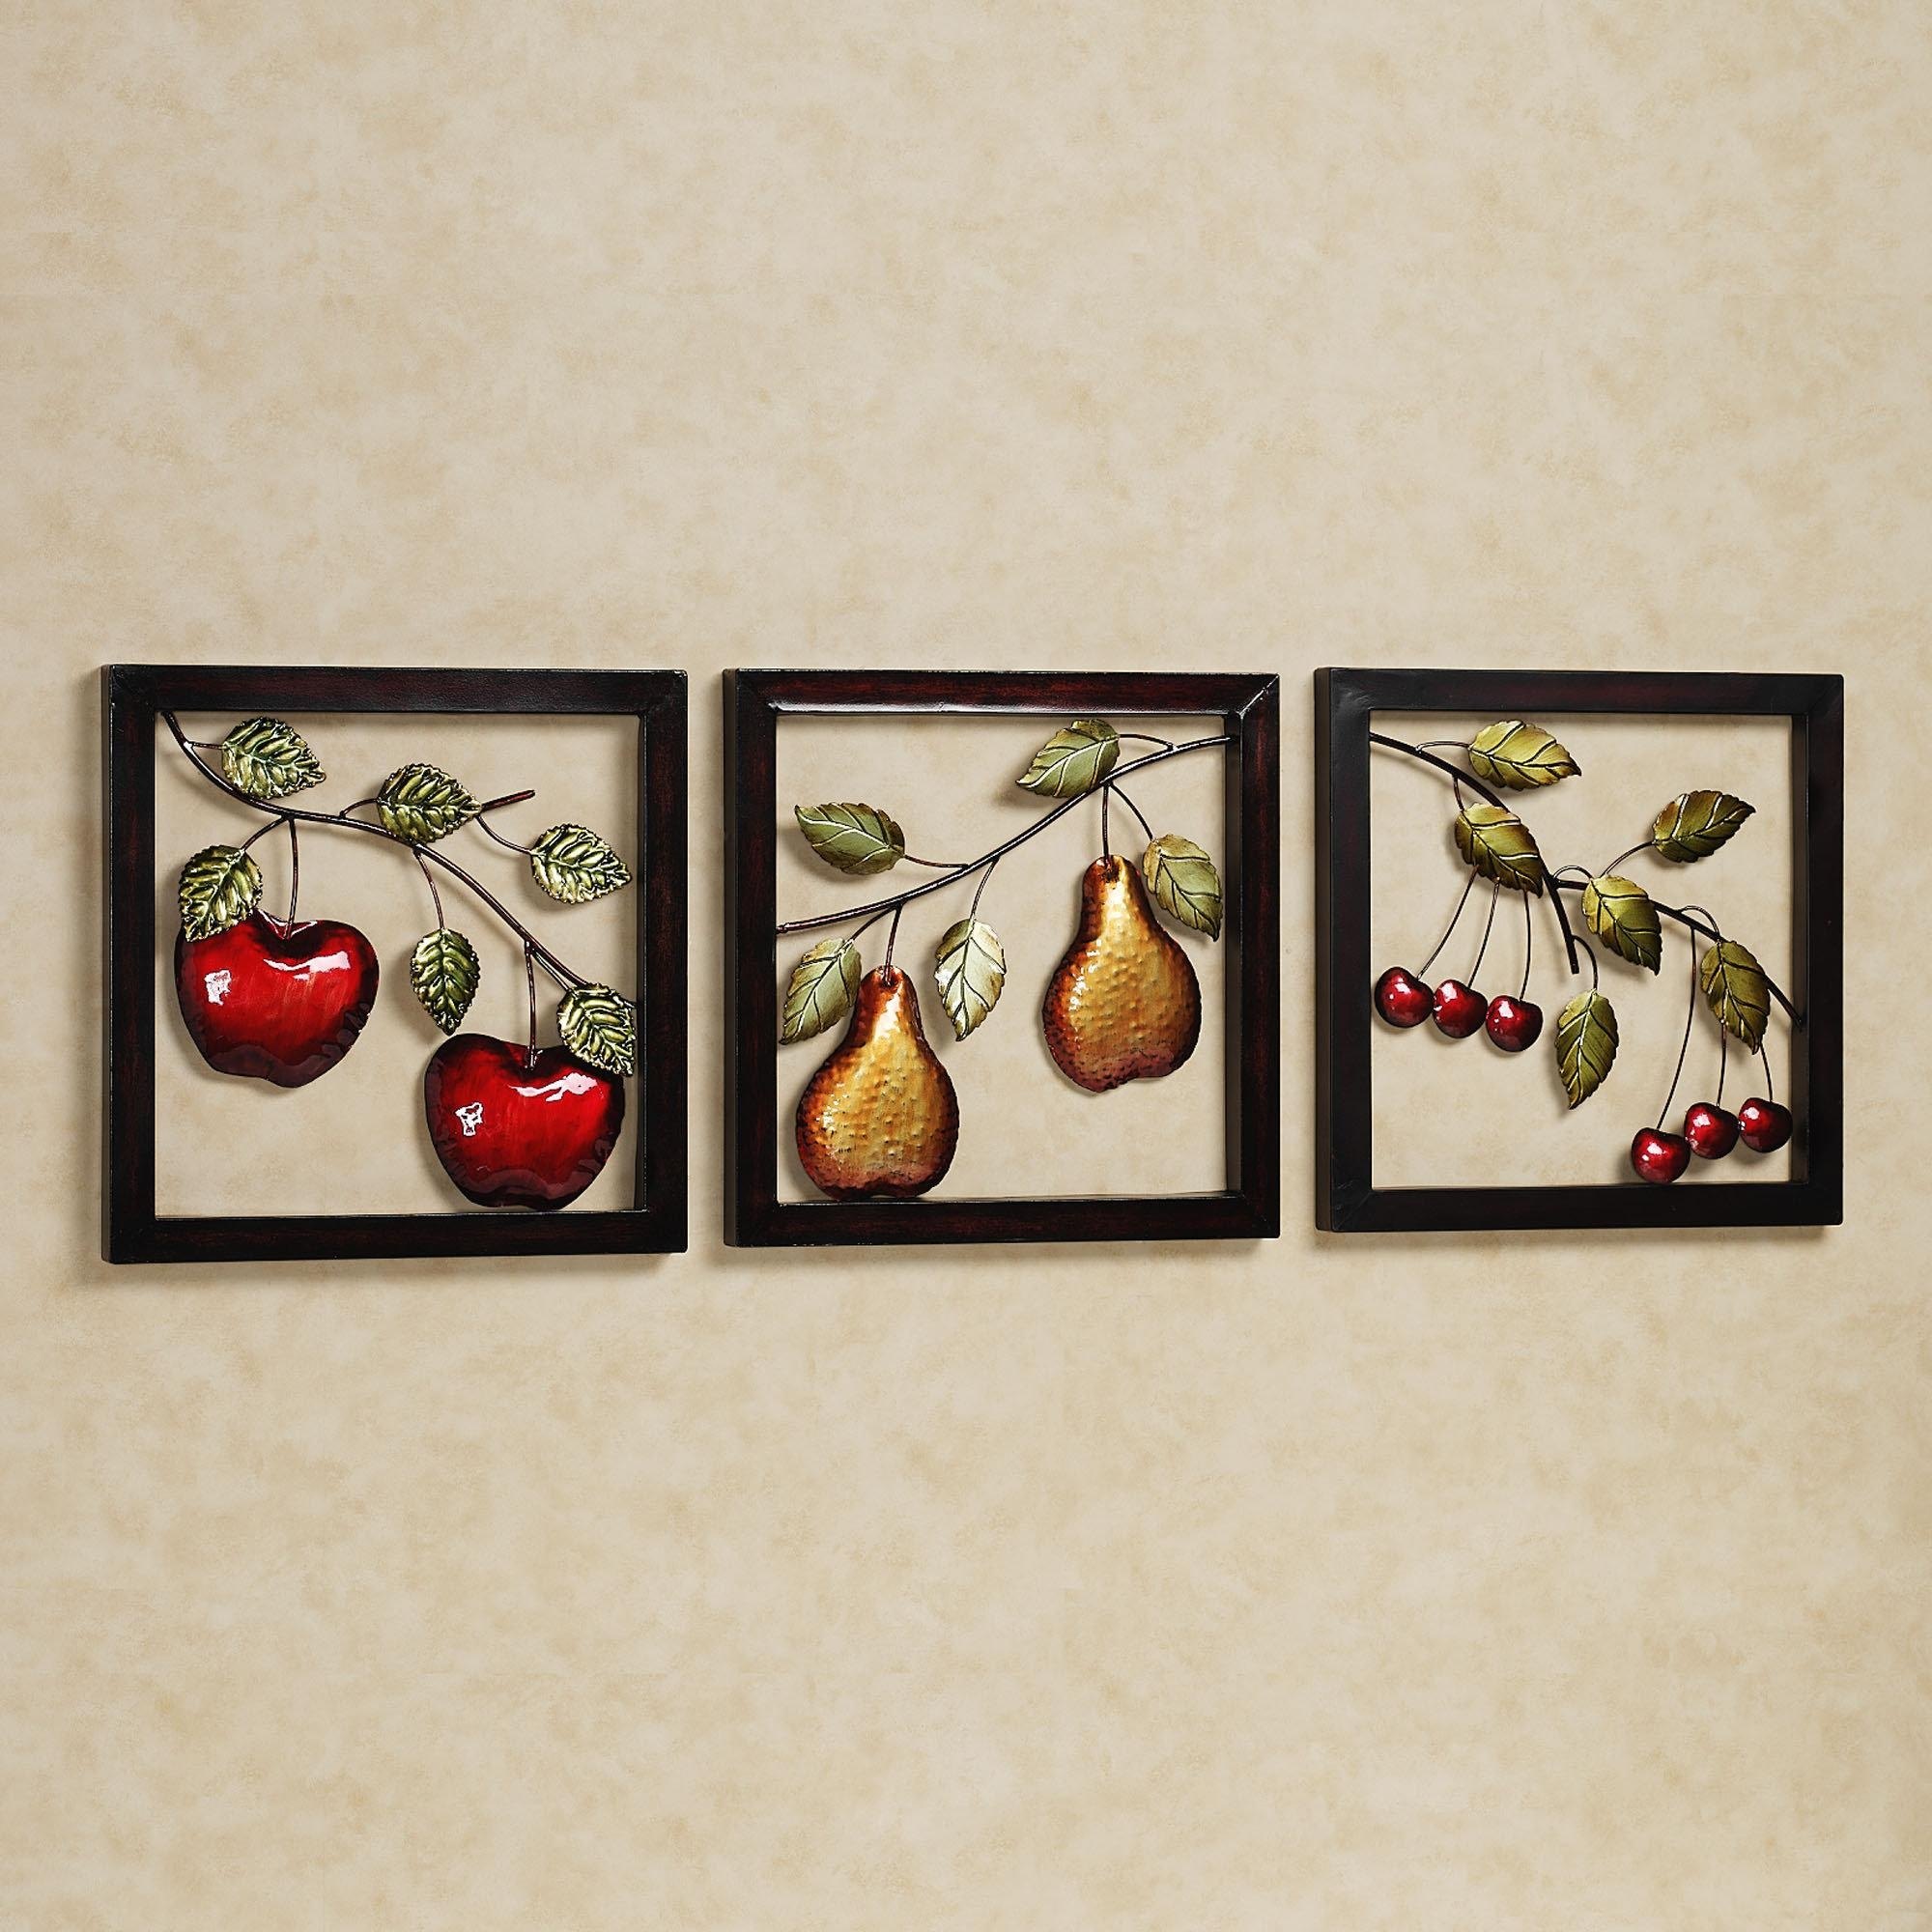 Kitchen Wall Decor Sets   Kitchen Decor Design Ideas throughout Kitchen Wall Art Sets